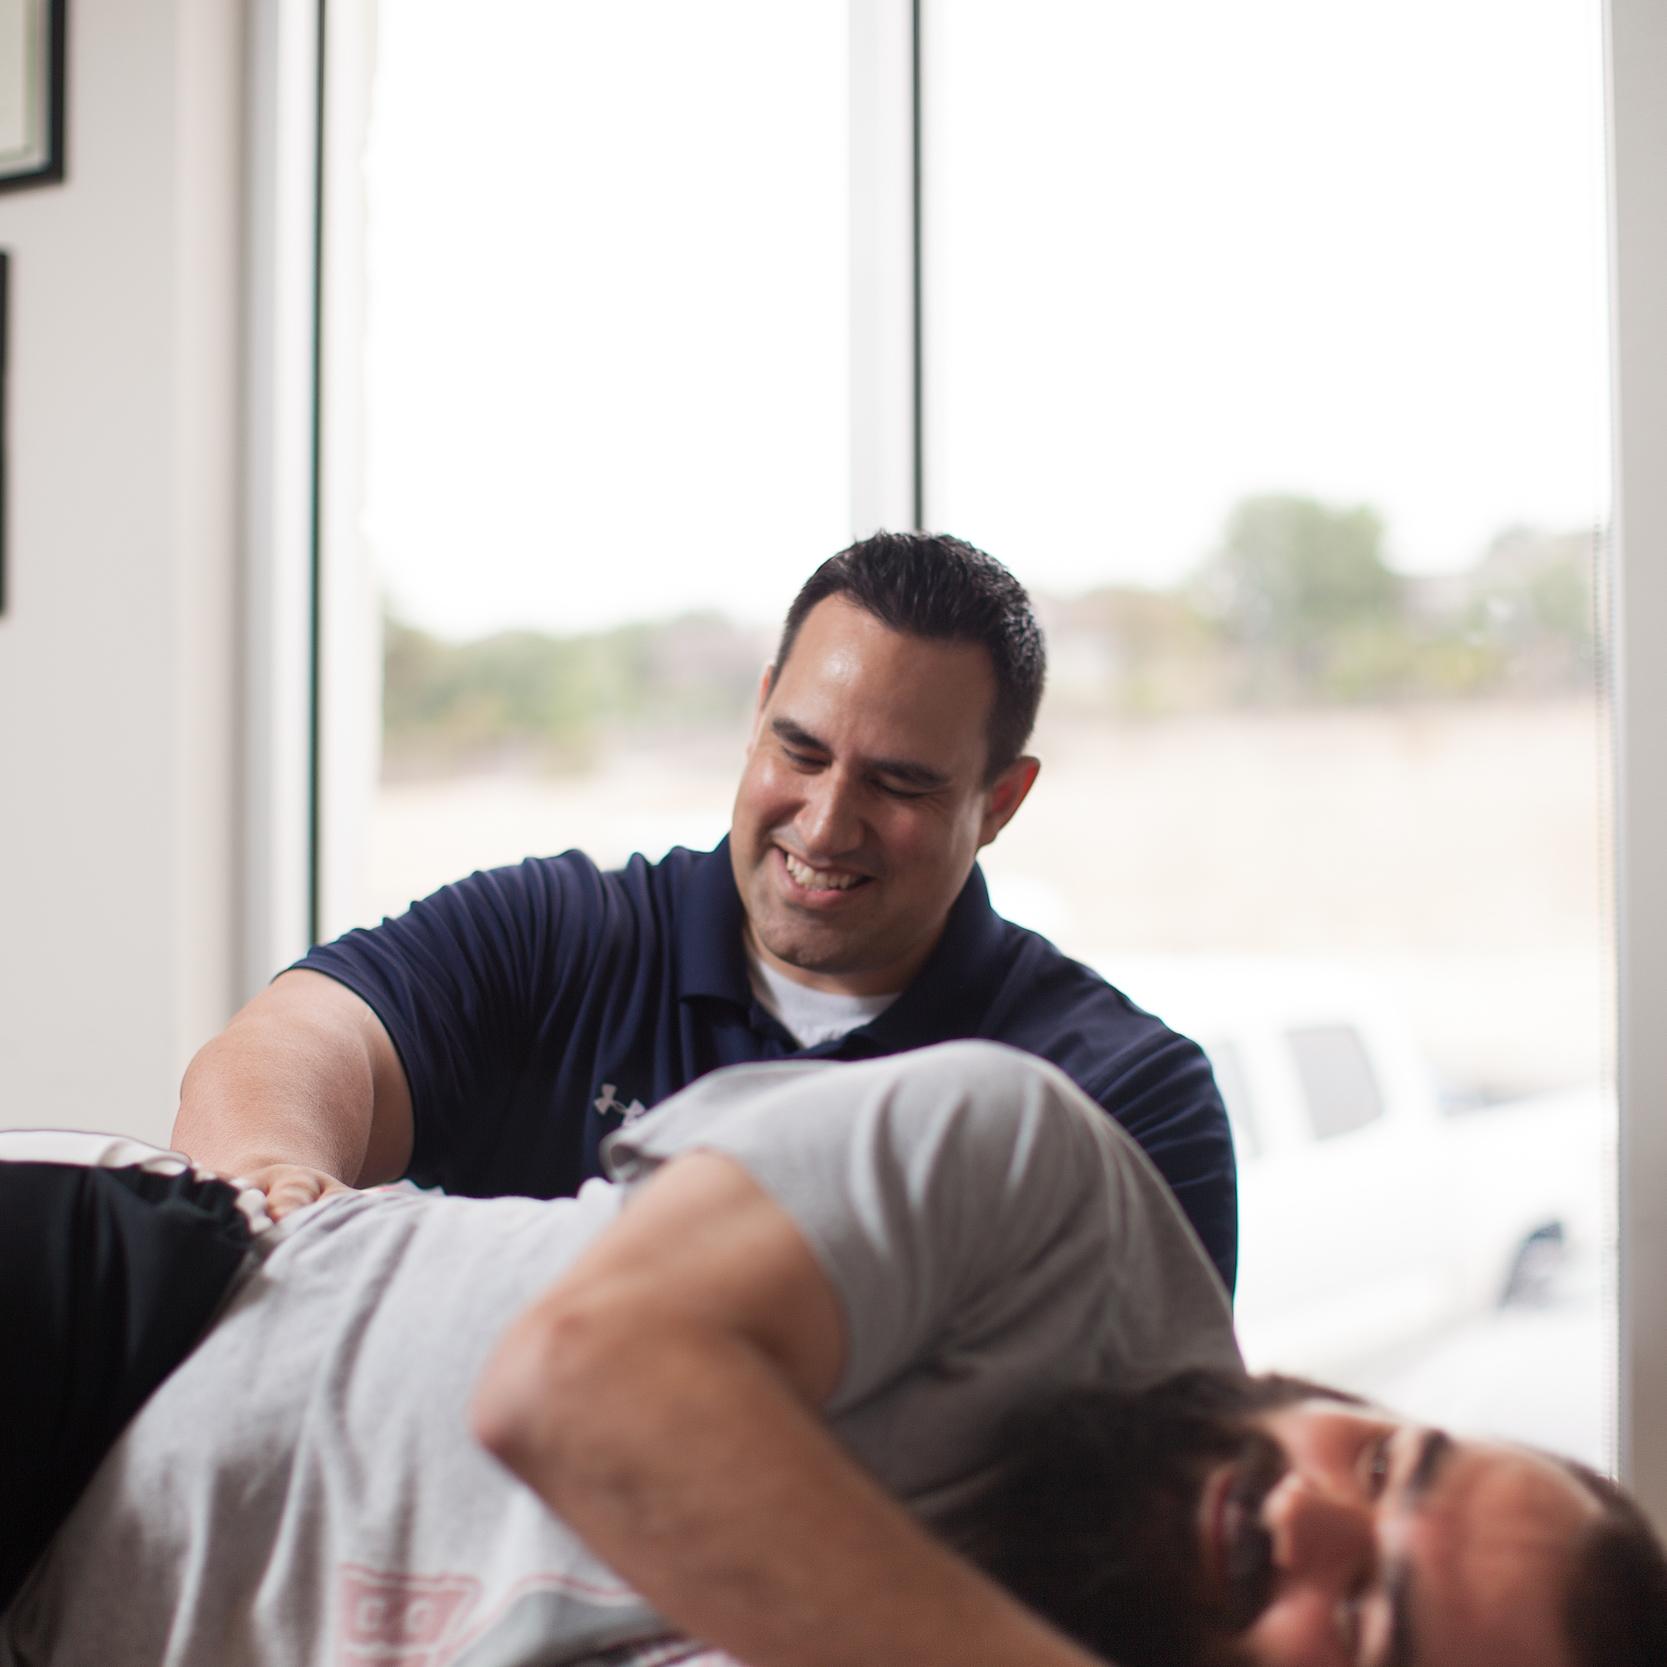 man getting chiropractic adjustment